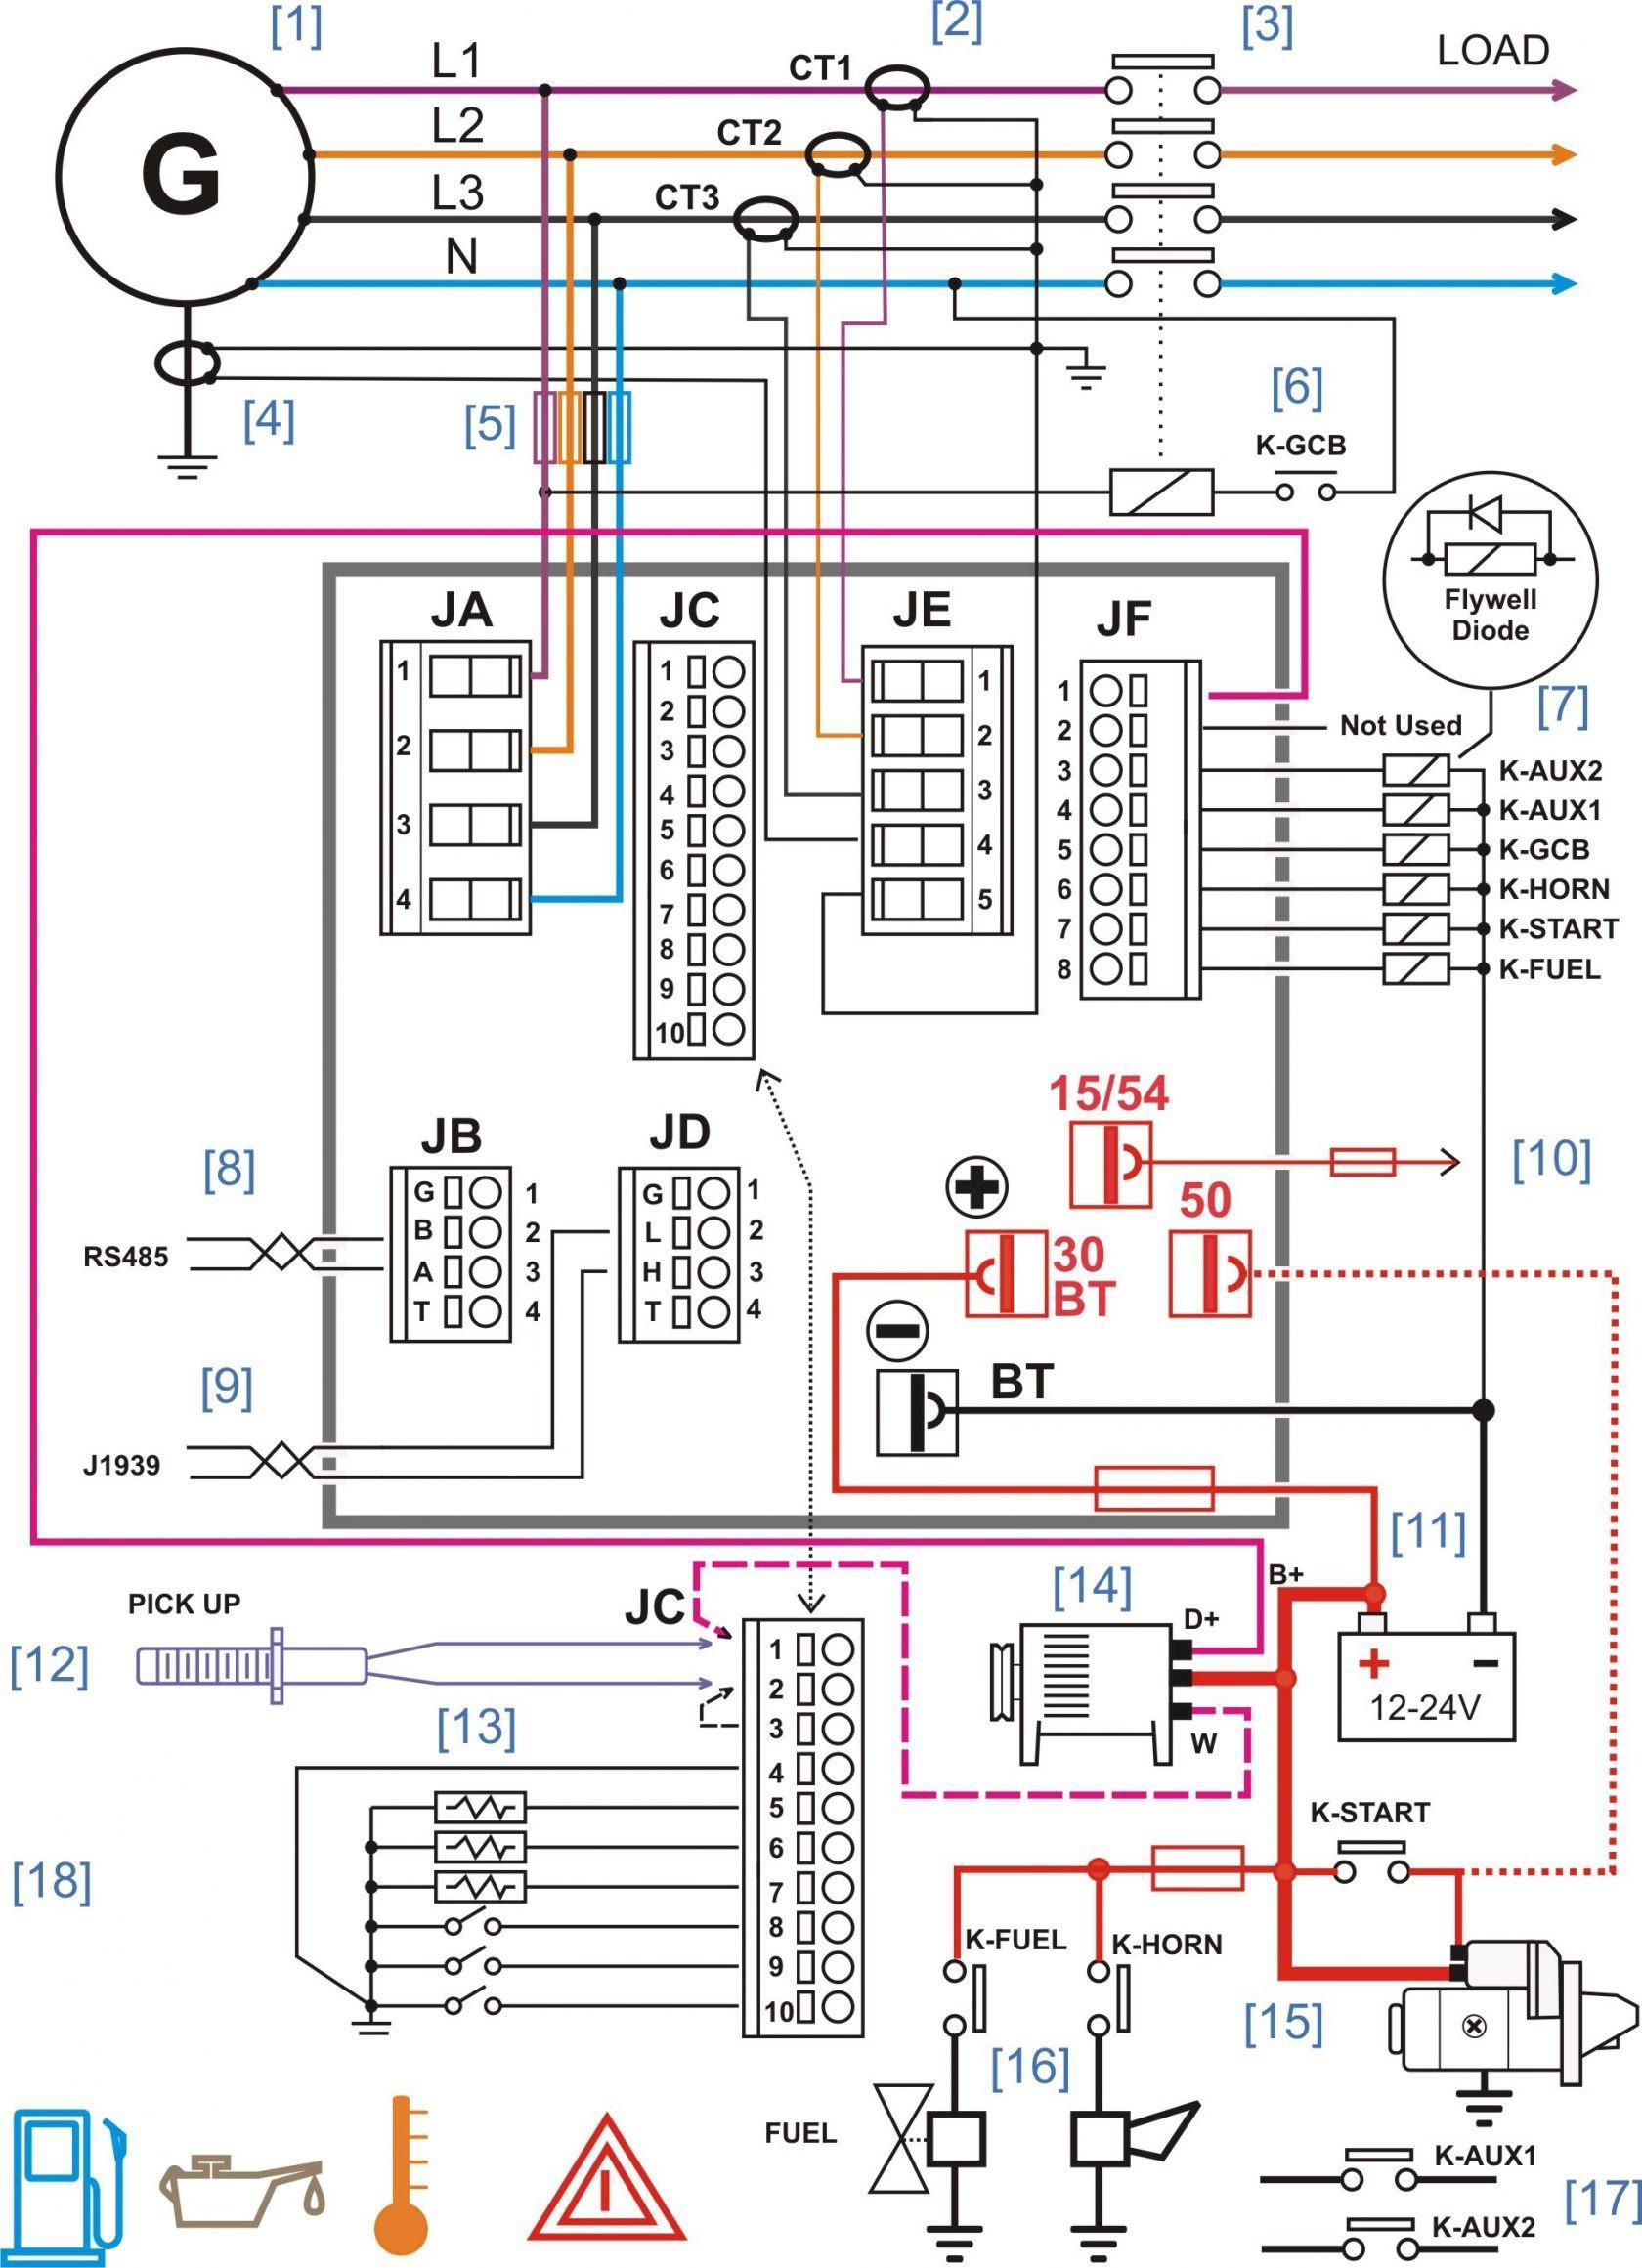 hight resolution of kubota l1500 diagram engine wiring library rh 97 evitta de kubota l1500 parts kubota l1500 font